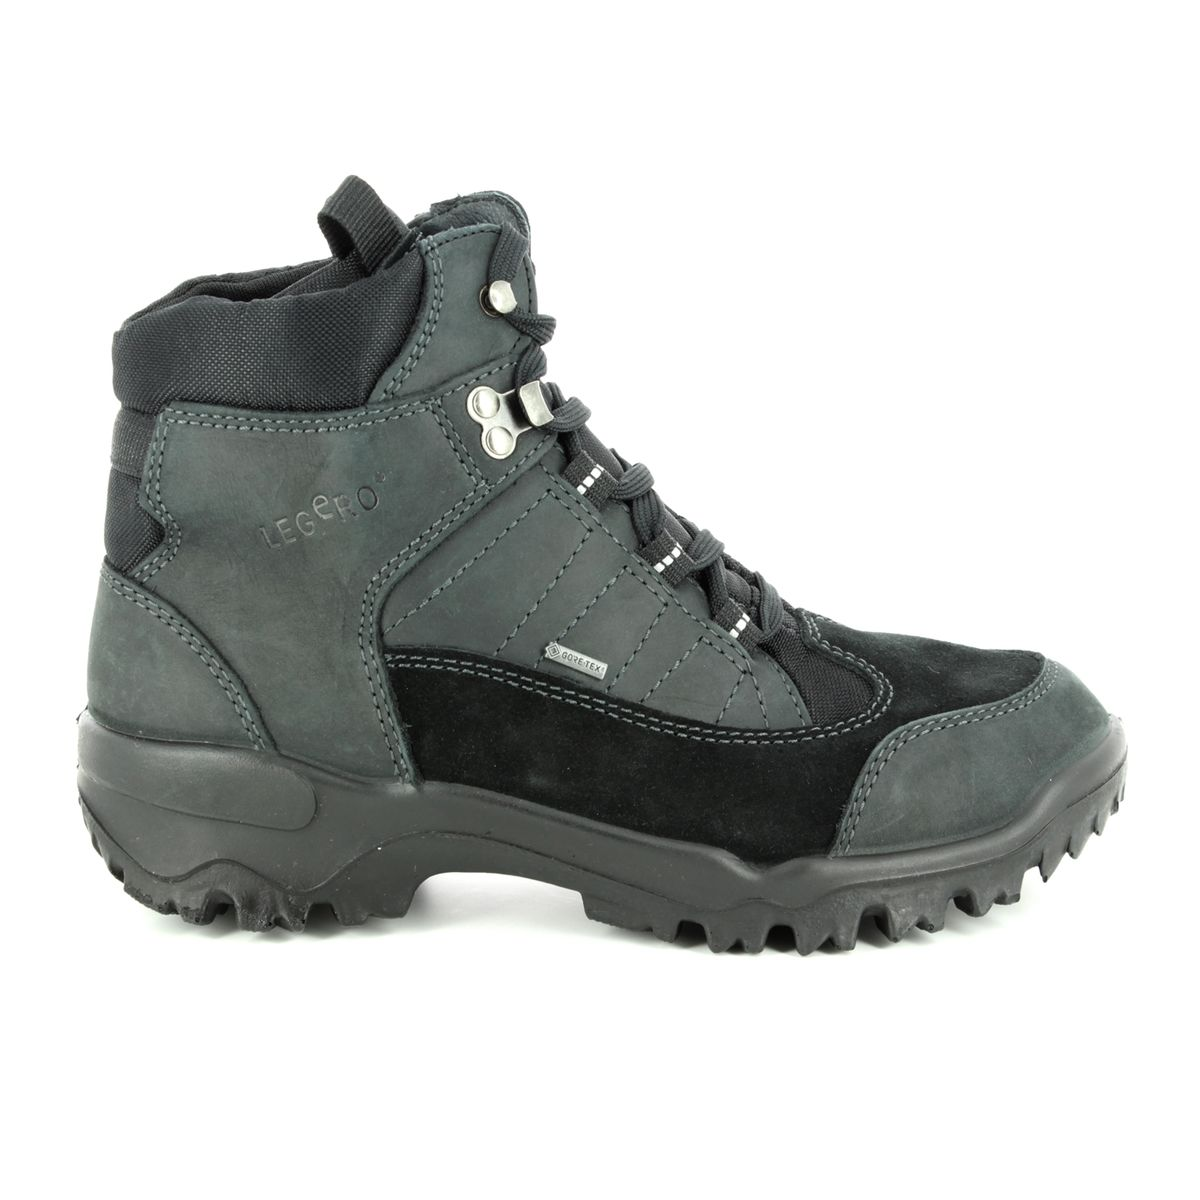 f95351d7e45 Legero Walking Boots - Black nubuck - 00502/00 WALK GTX LADIE